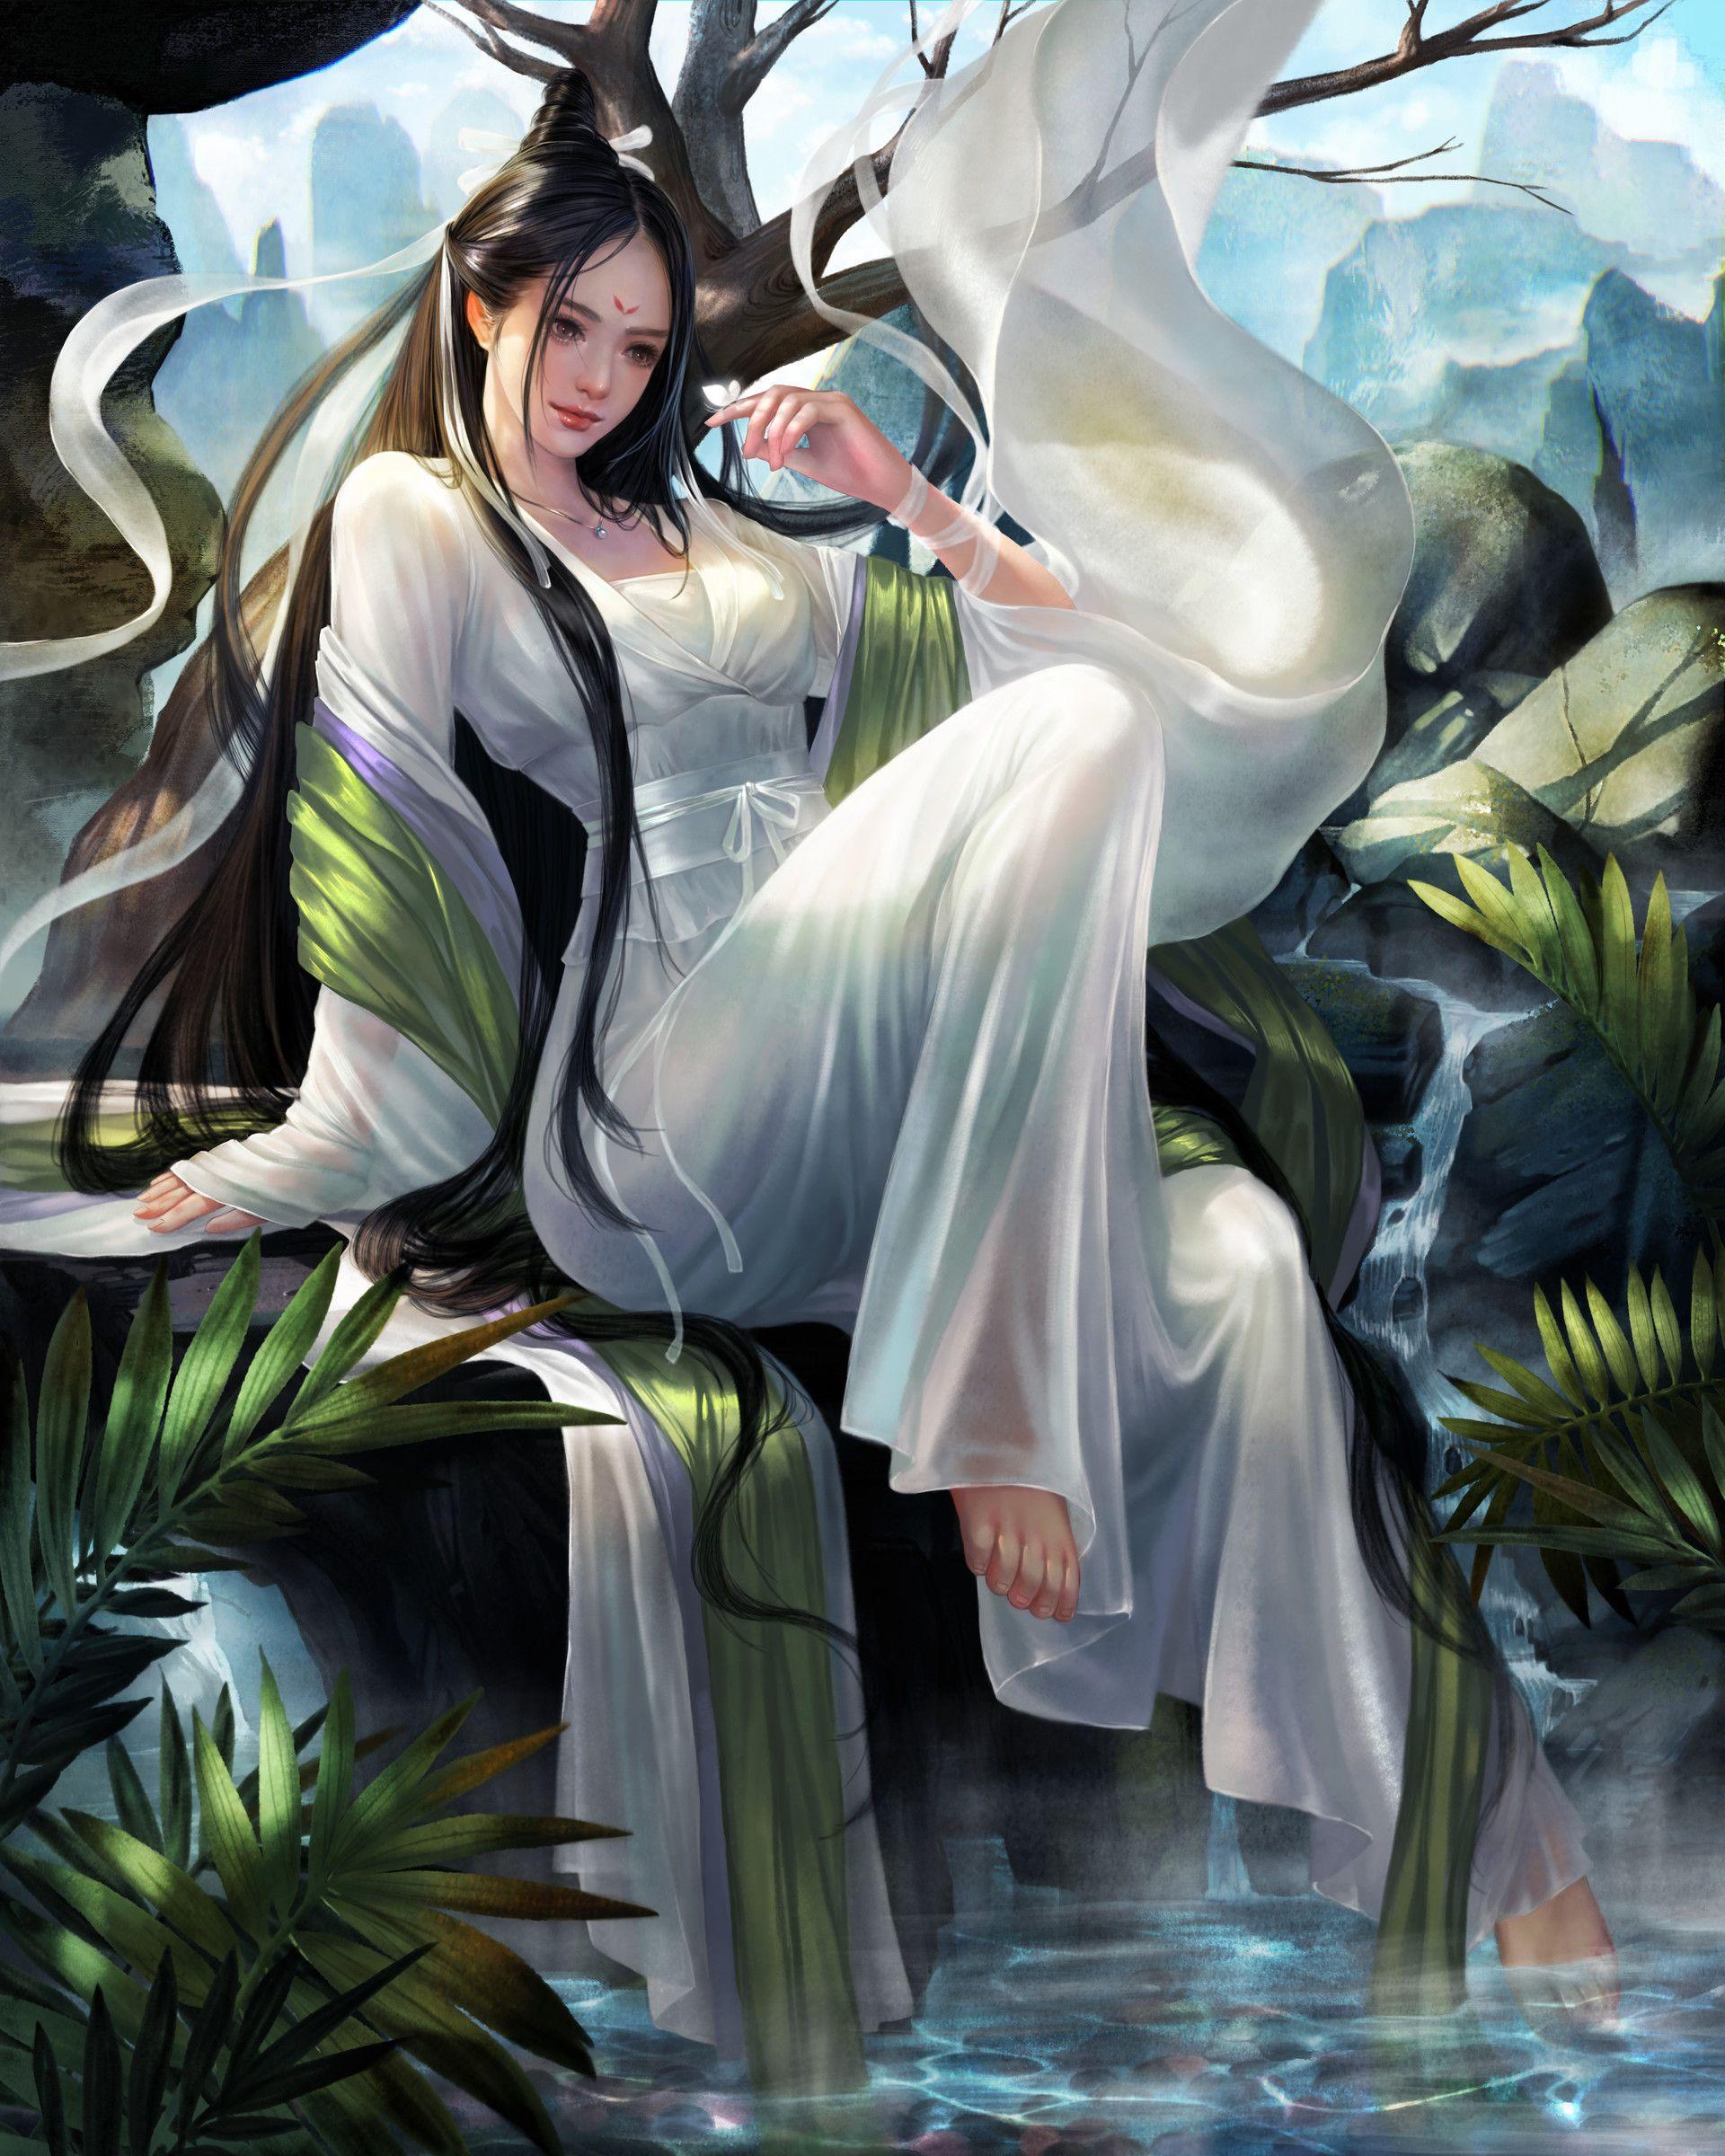 ArtStation - 中国妹子, Li Zi